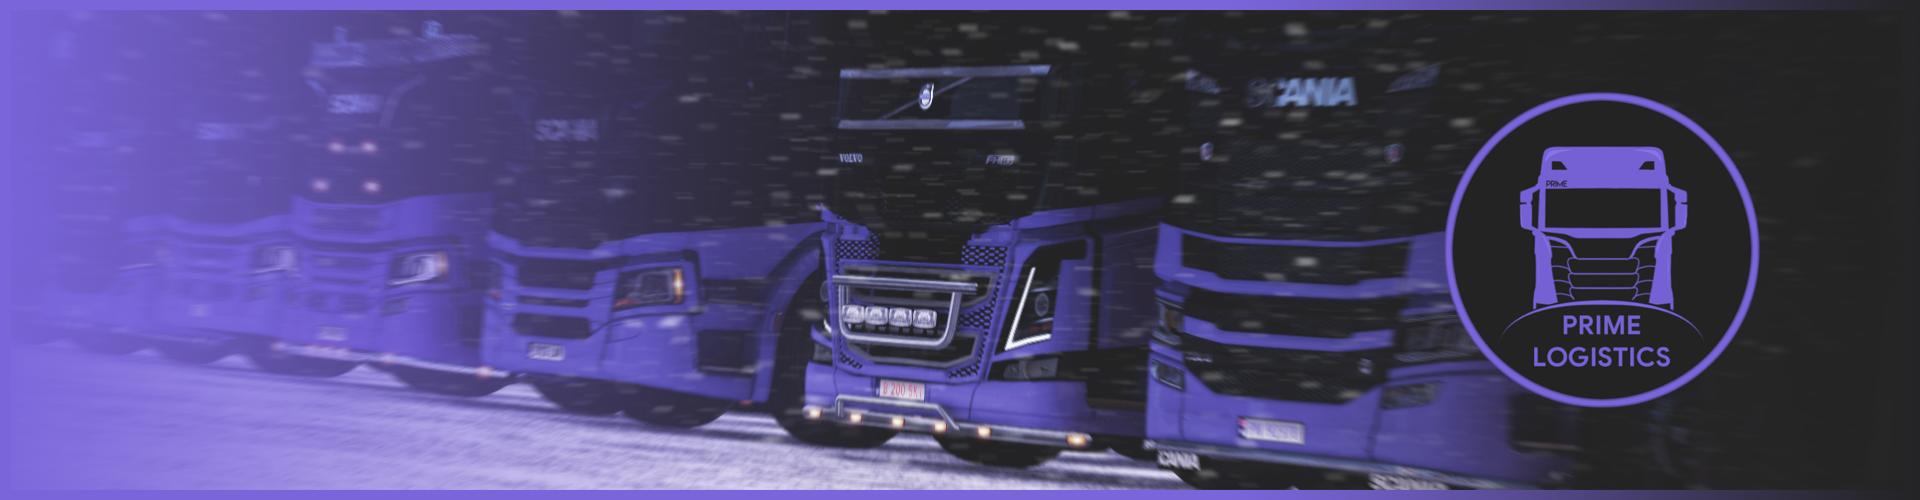 🟣 Prime Logistics Convoy #97